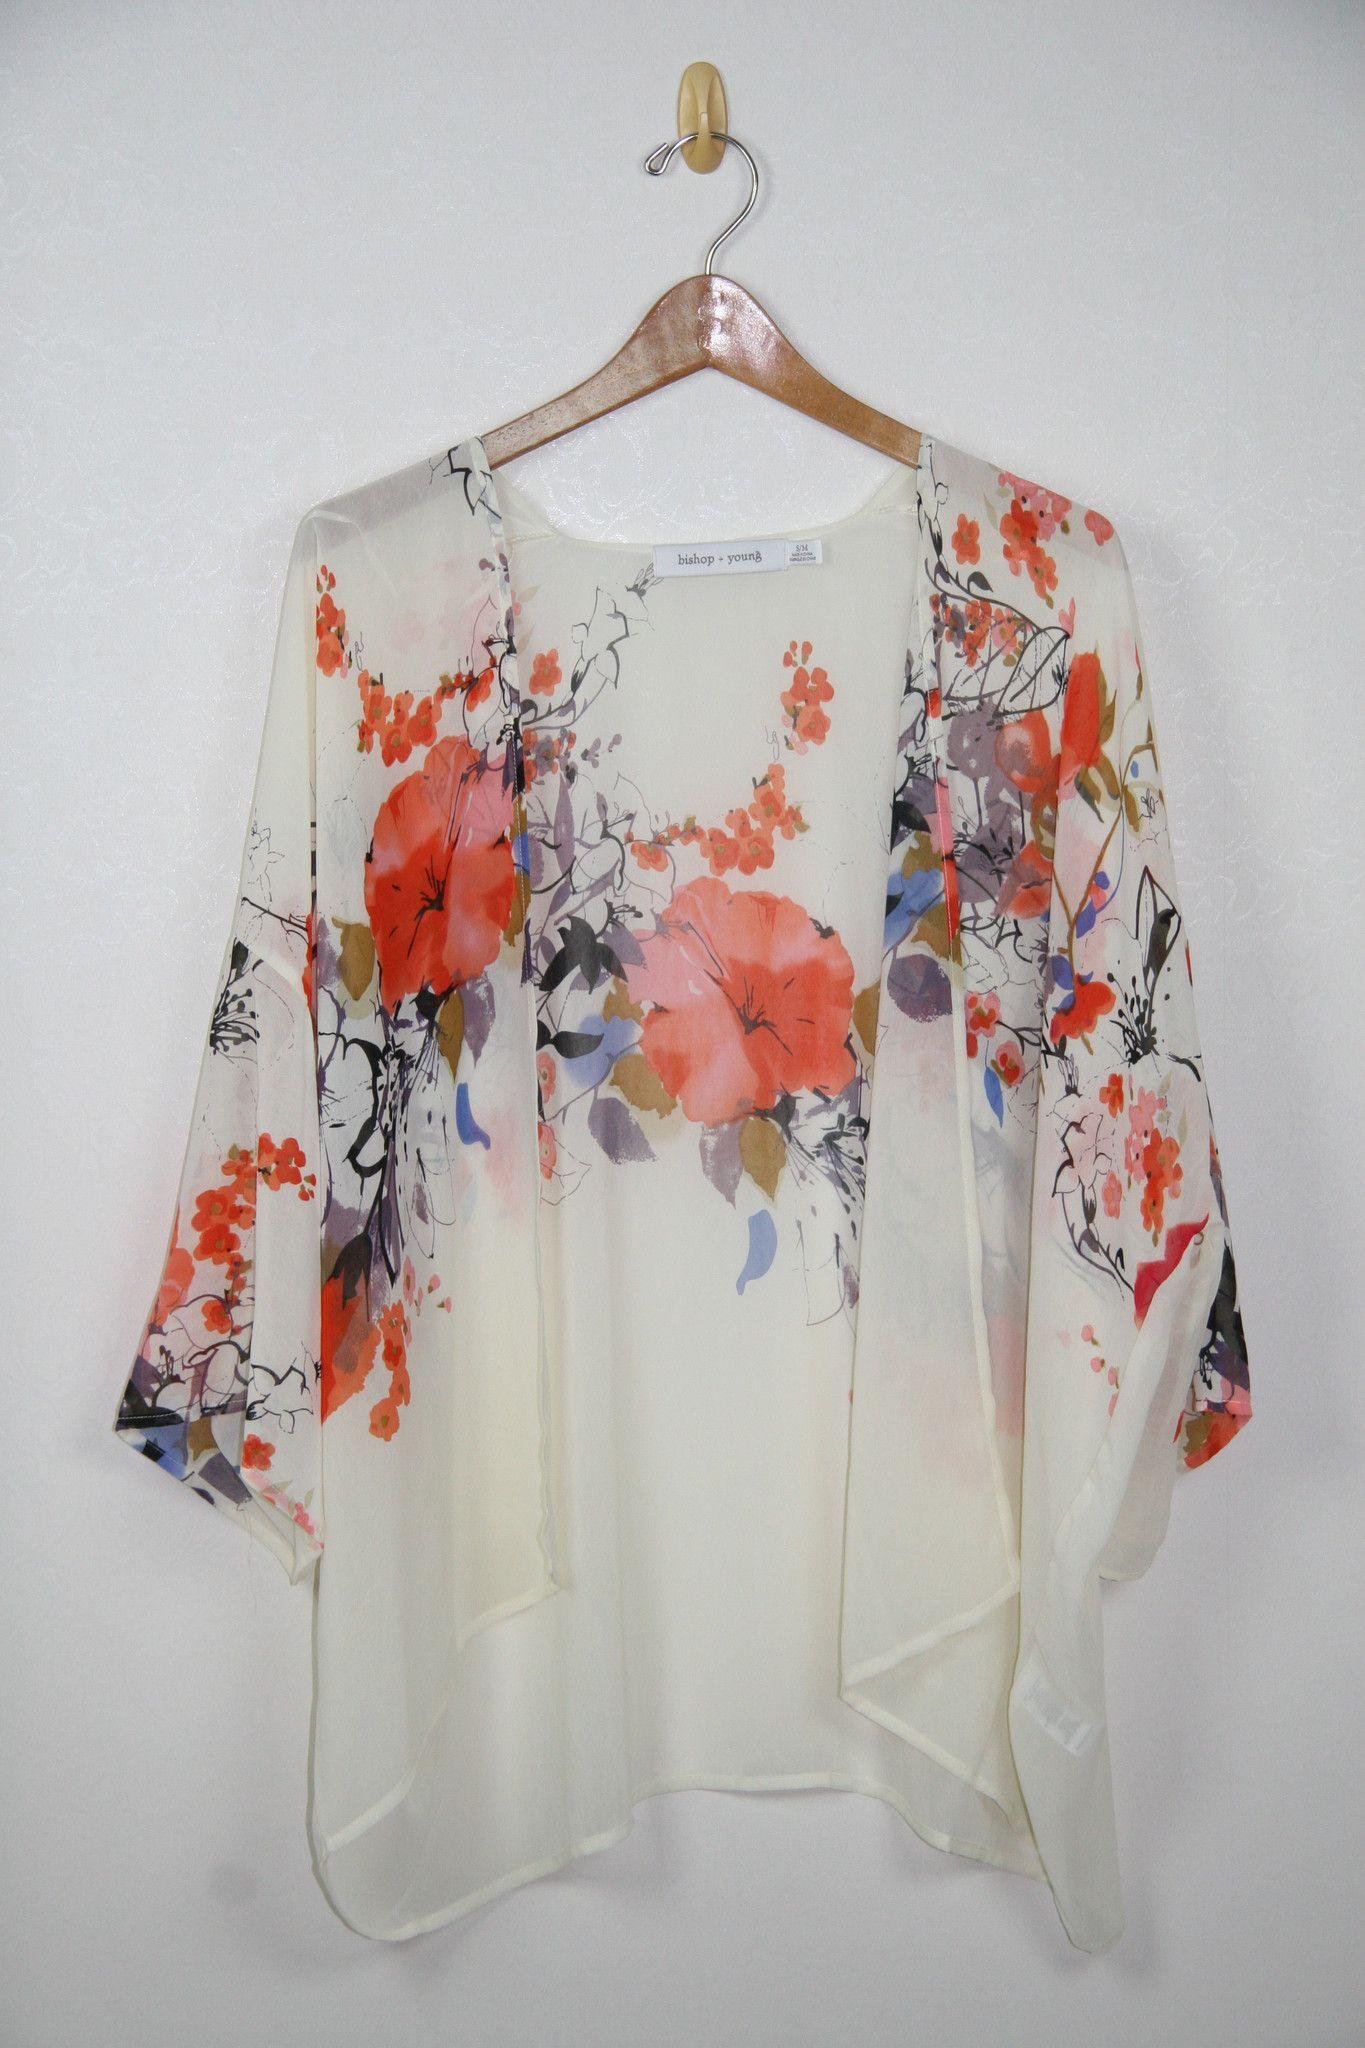 Since I Love The Kimono Style Dresses I Ve Seen On: Bishop + Young Floral Shawl Flin Kimono. I Love This